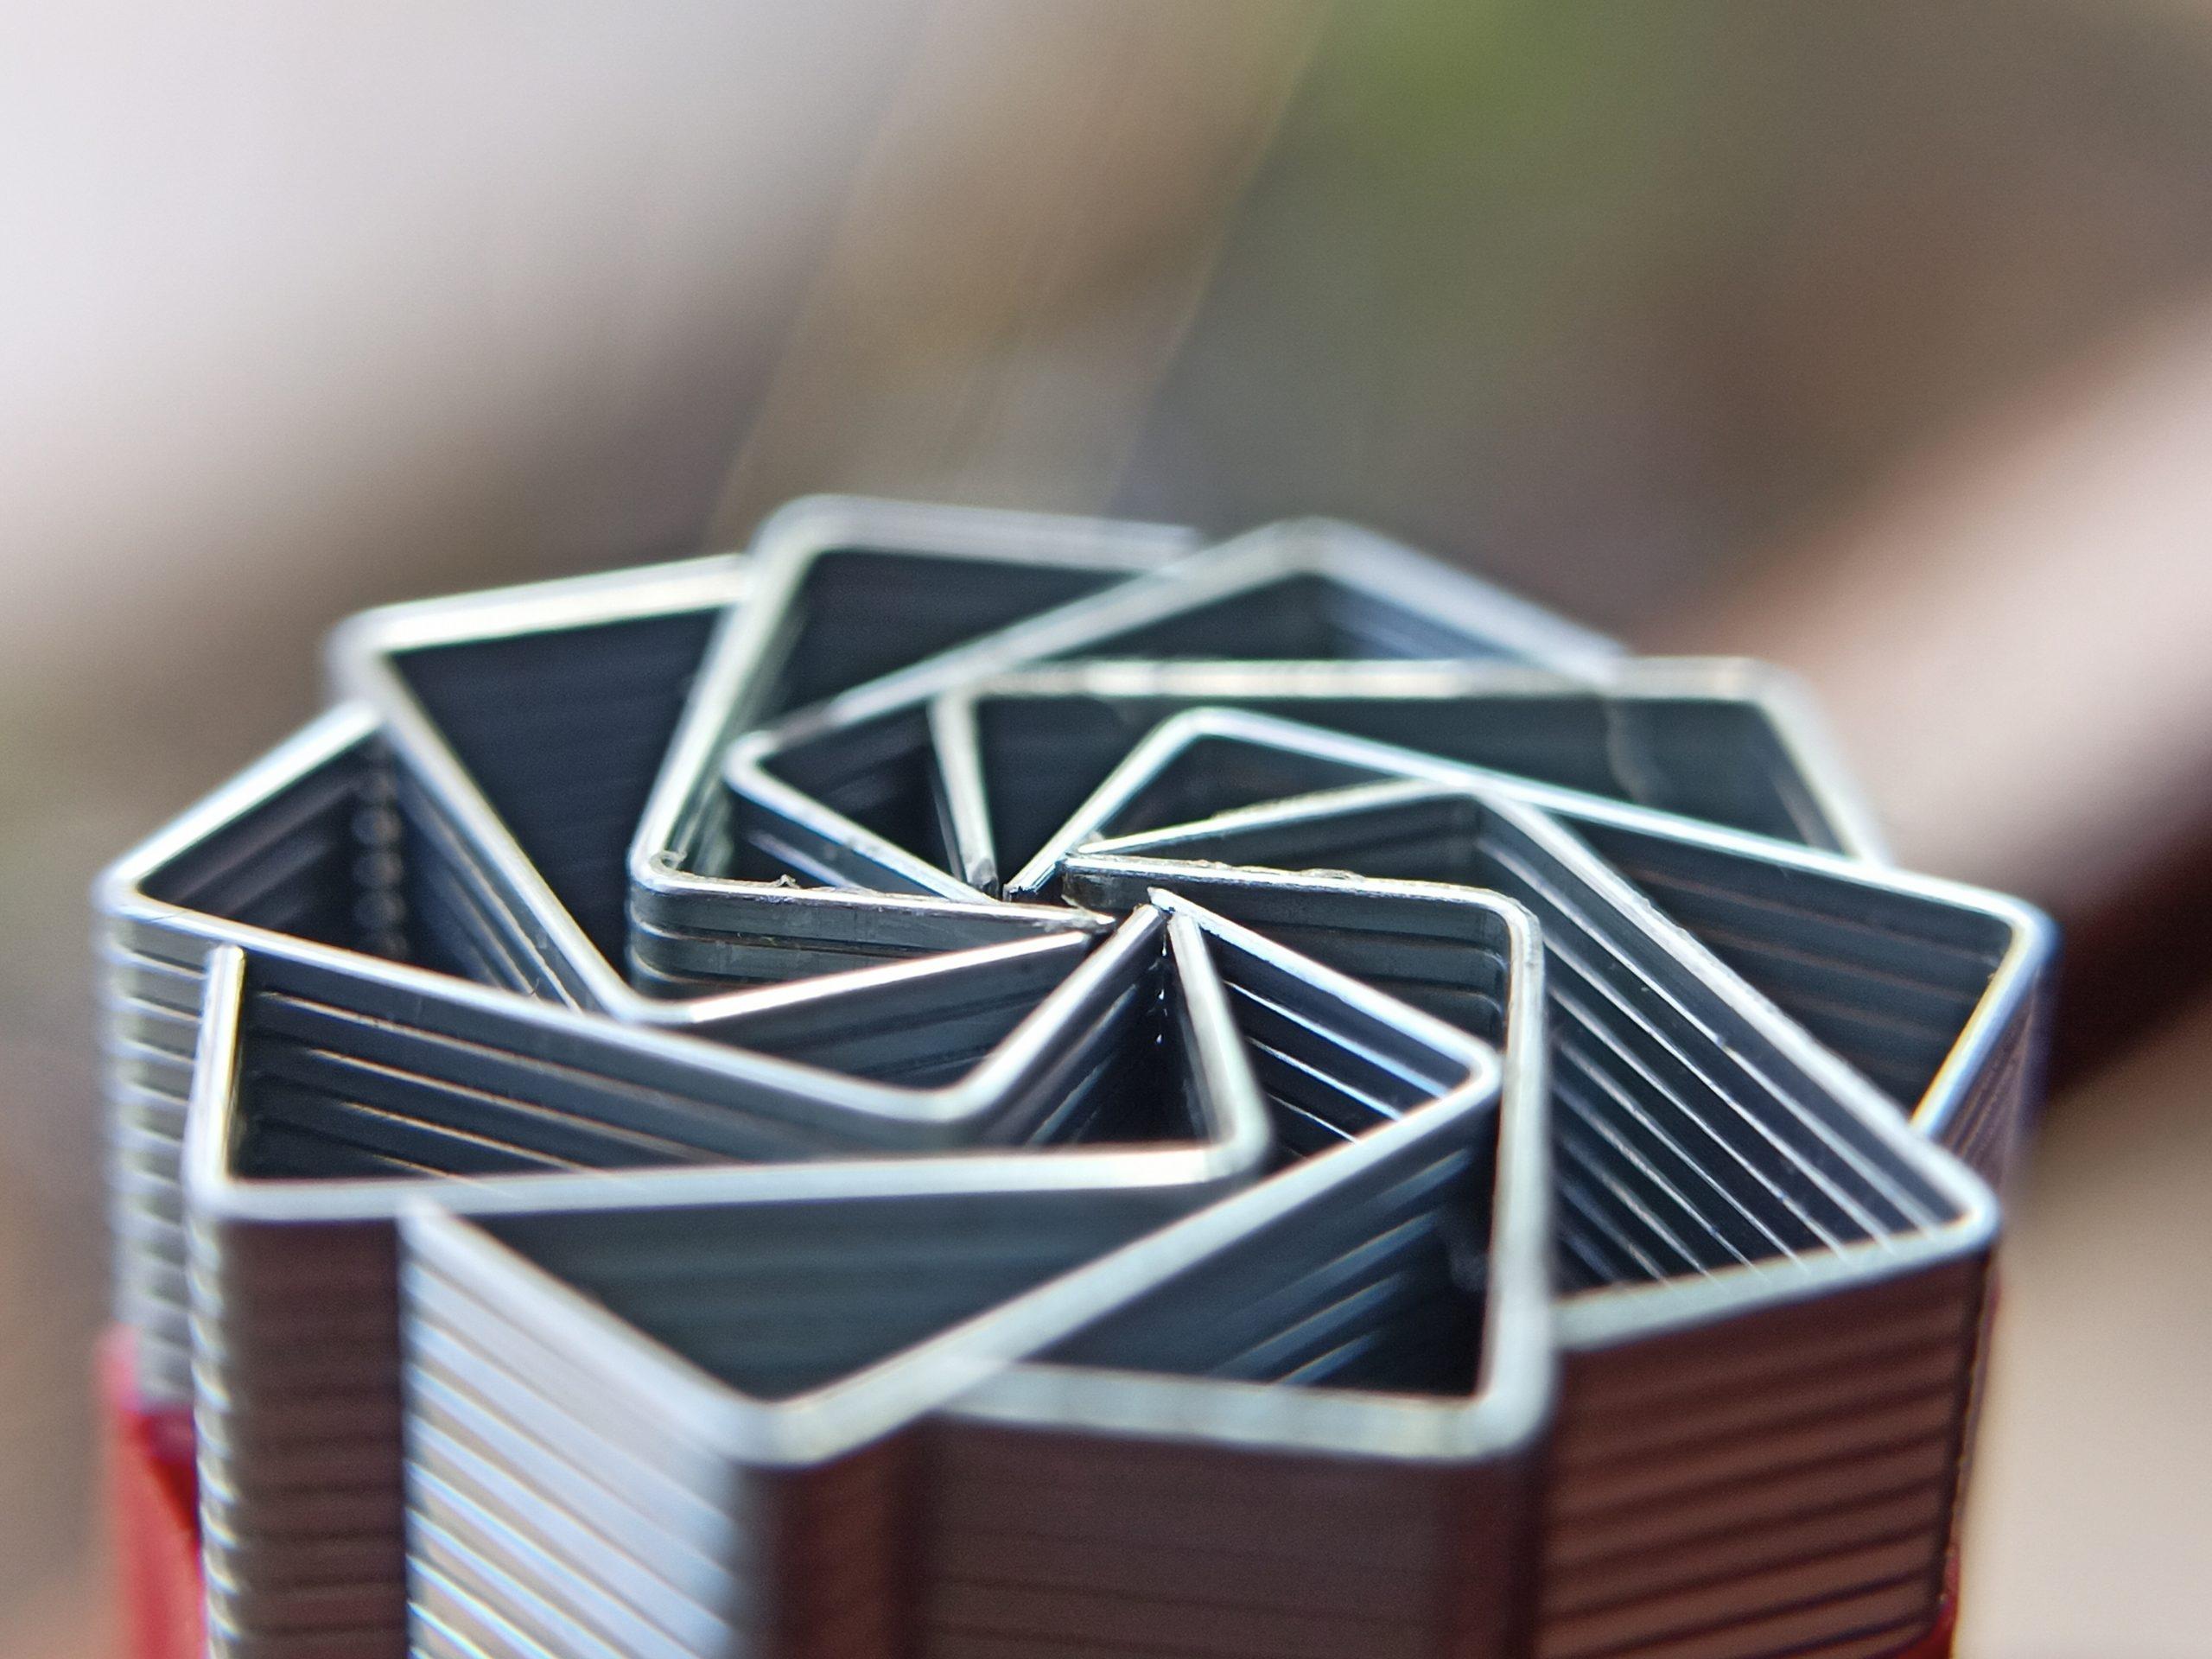 Stapler pins arranged in a pattern